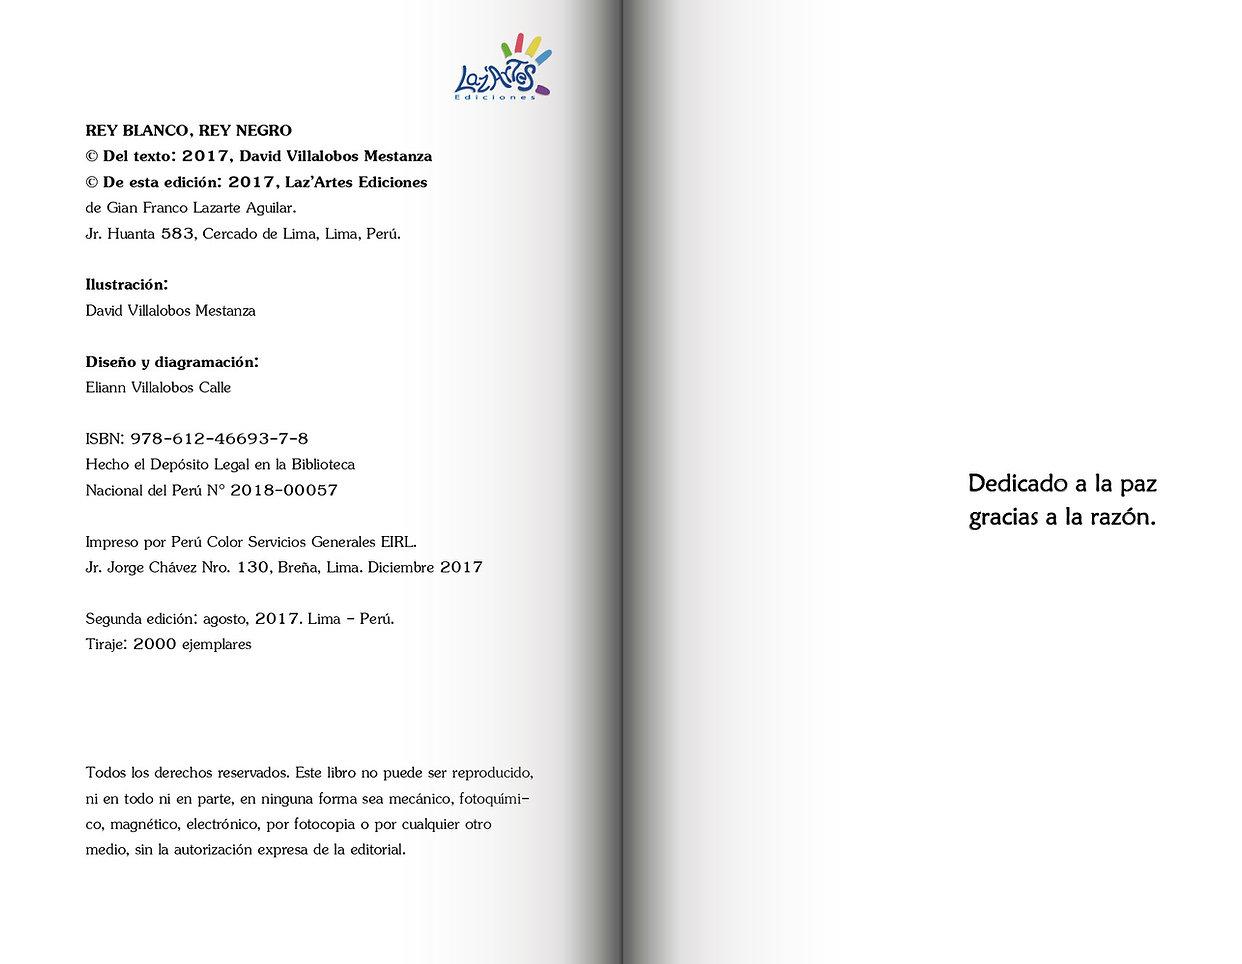 Rey Blanco 2-3.jpg